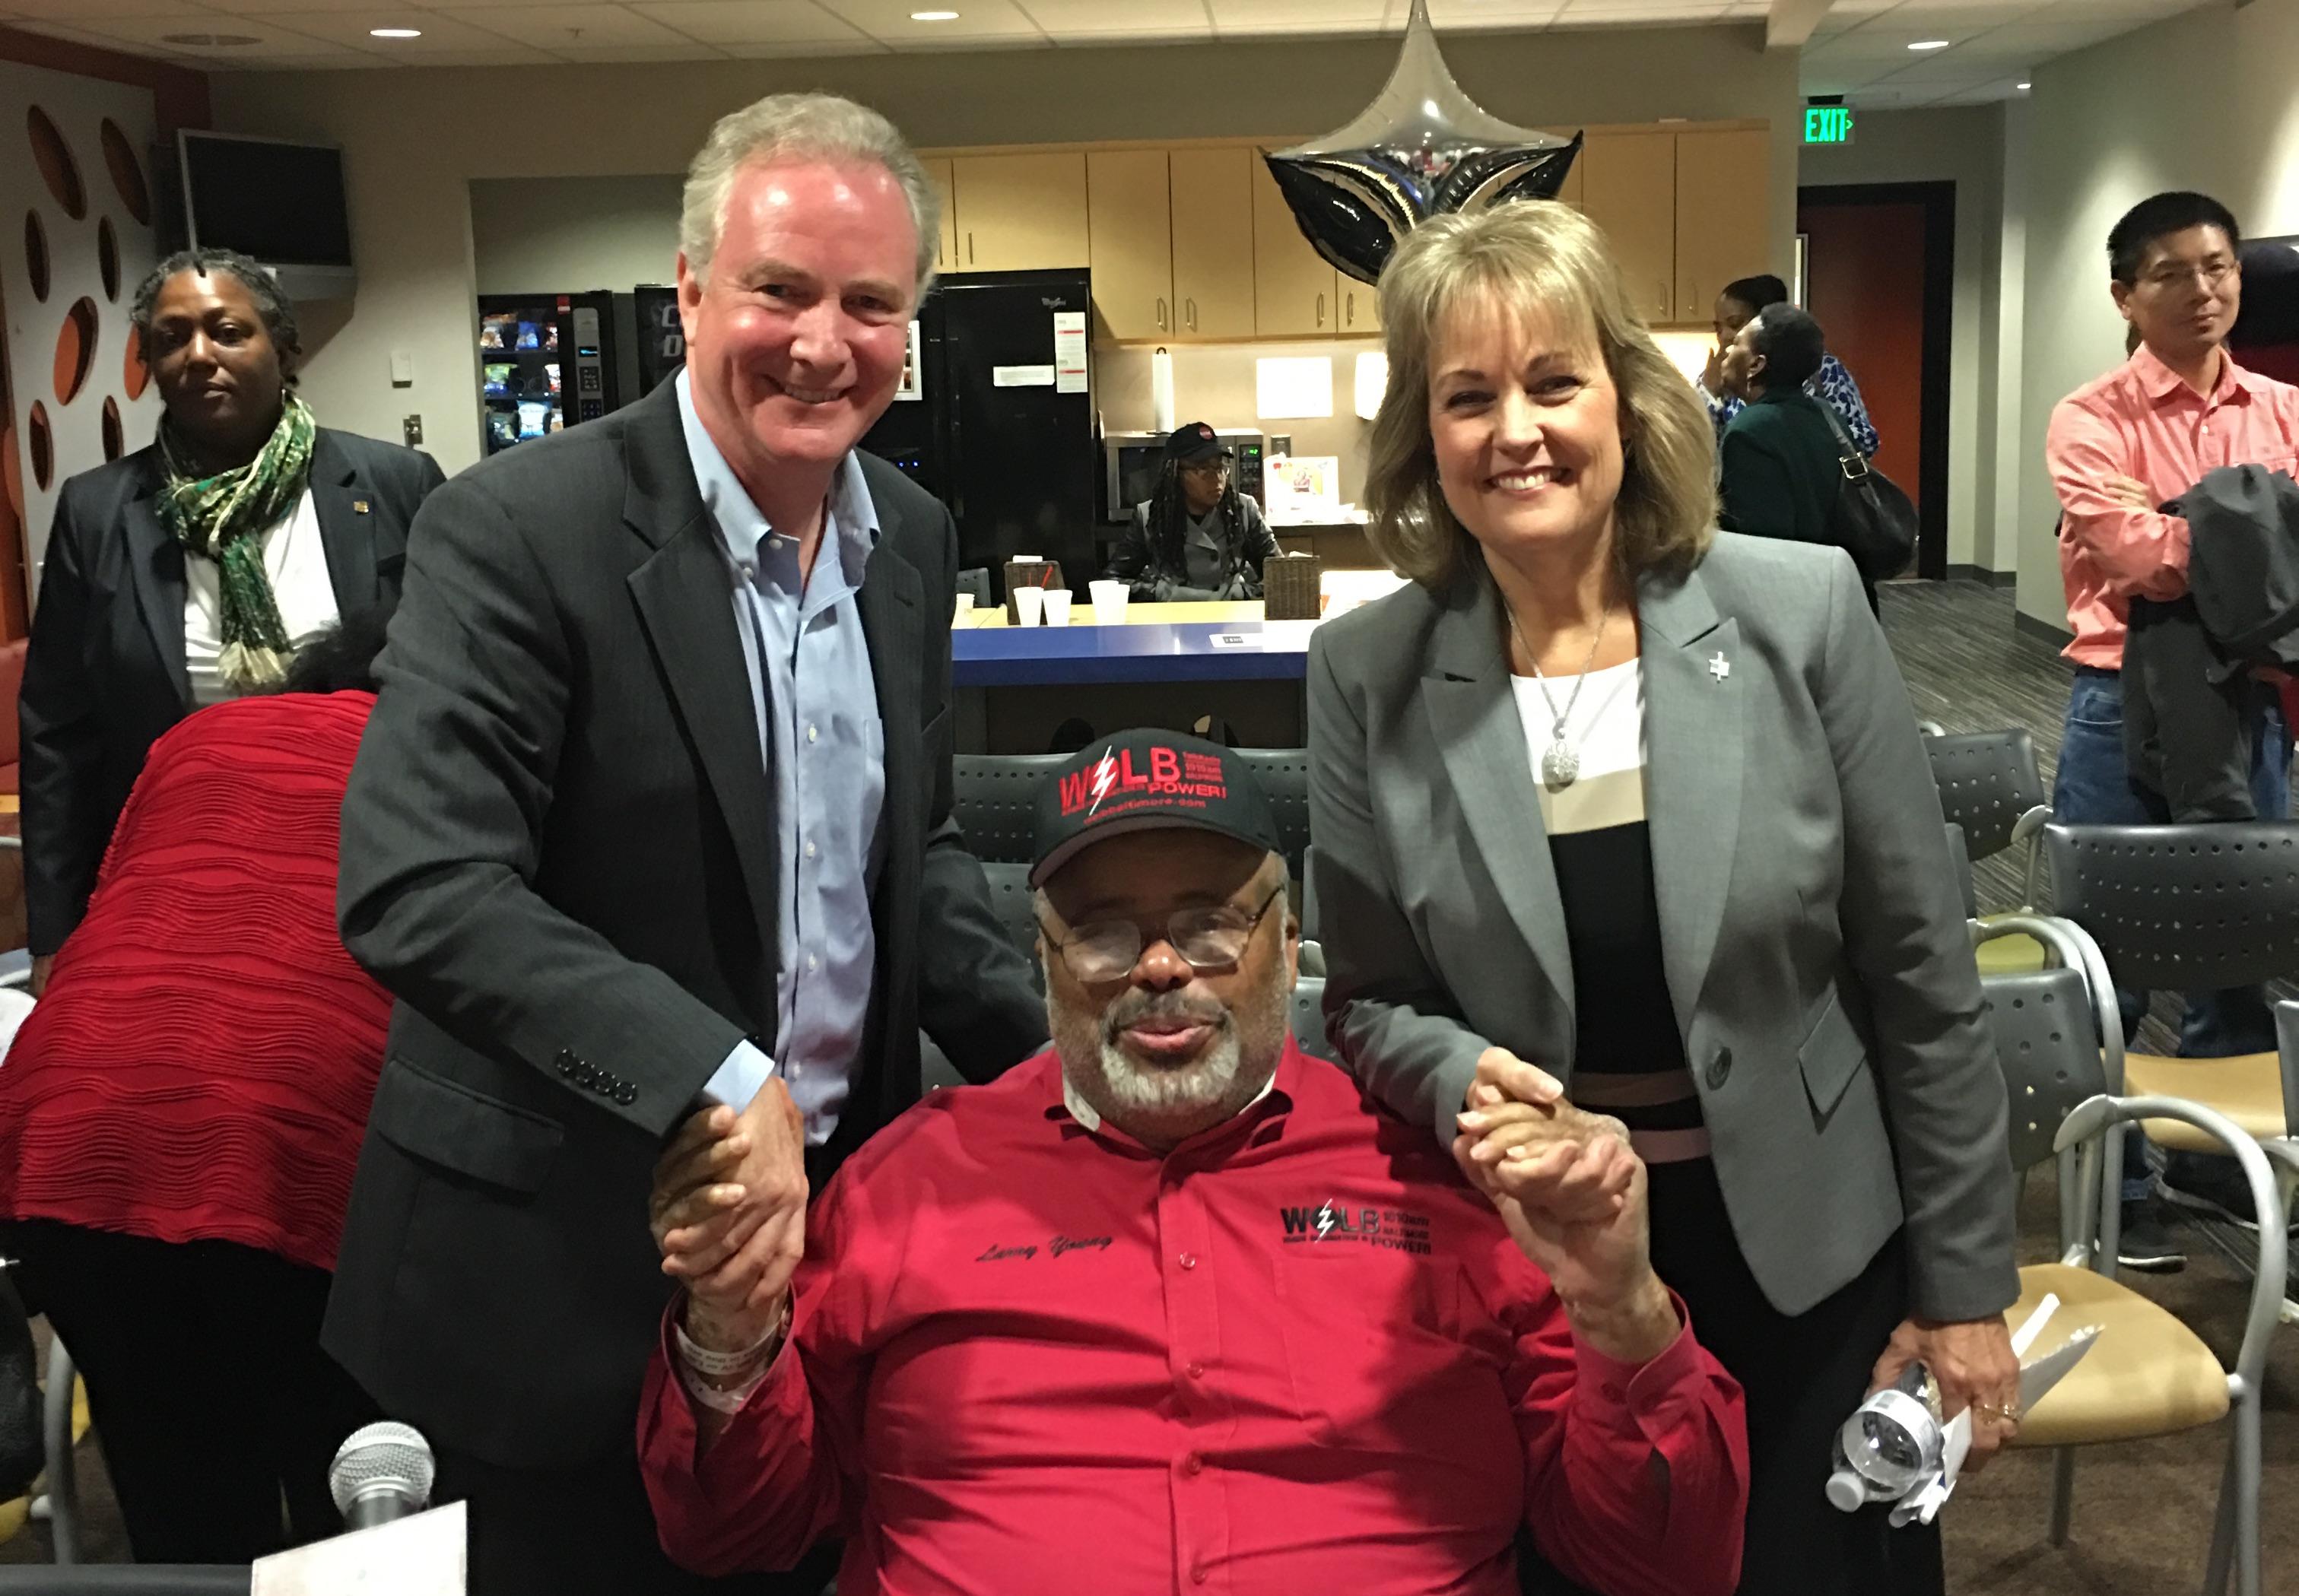 Chris VanHollen, Larry Young and Kathy Szeliga